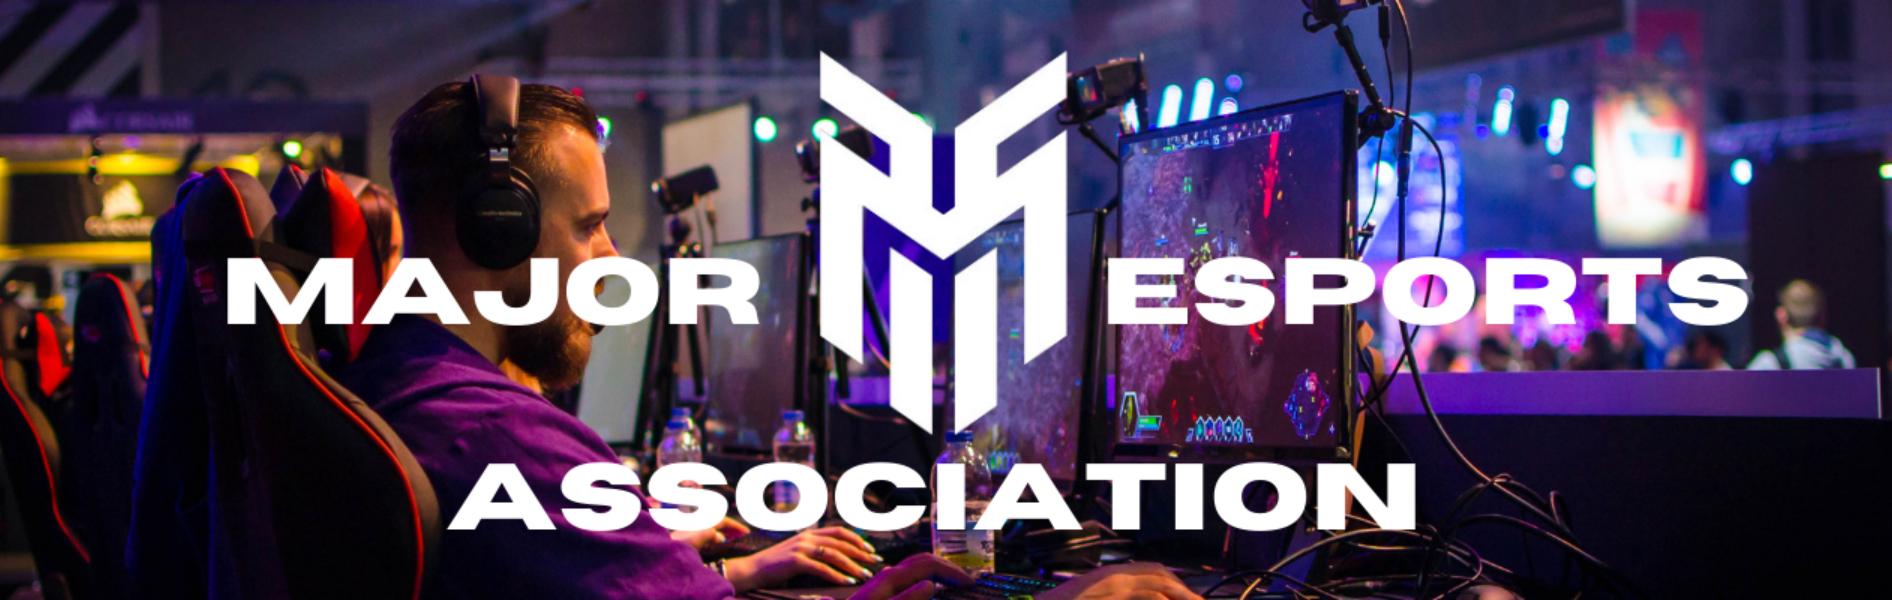 Major Esports Association Banner